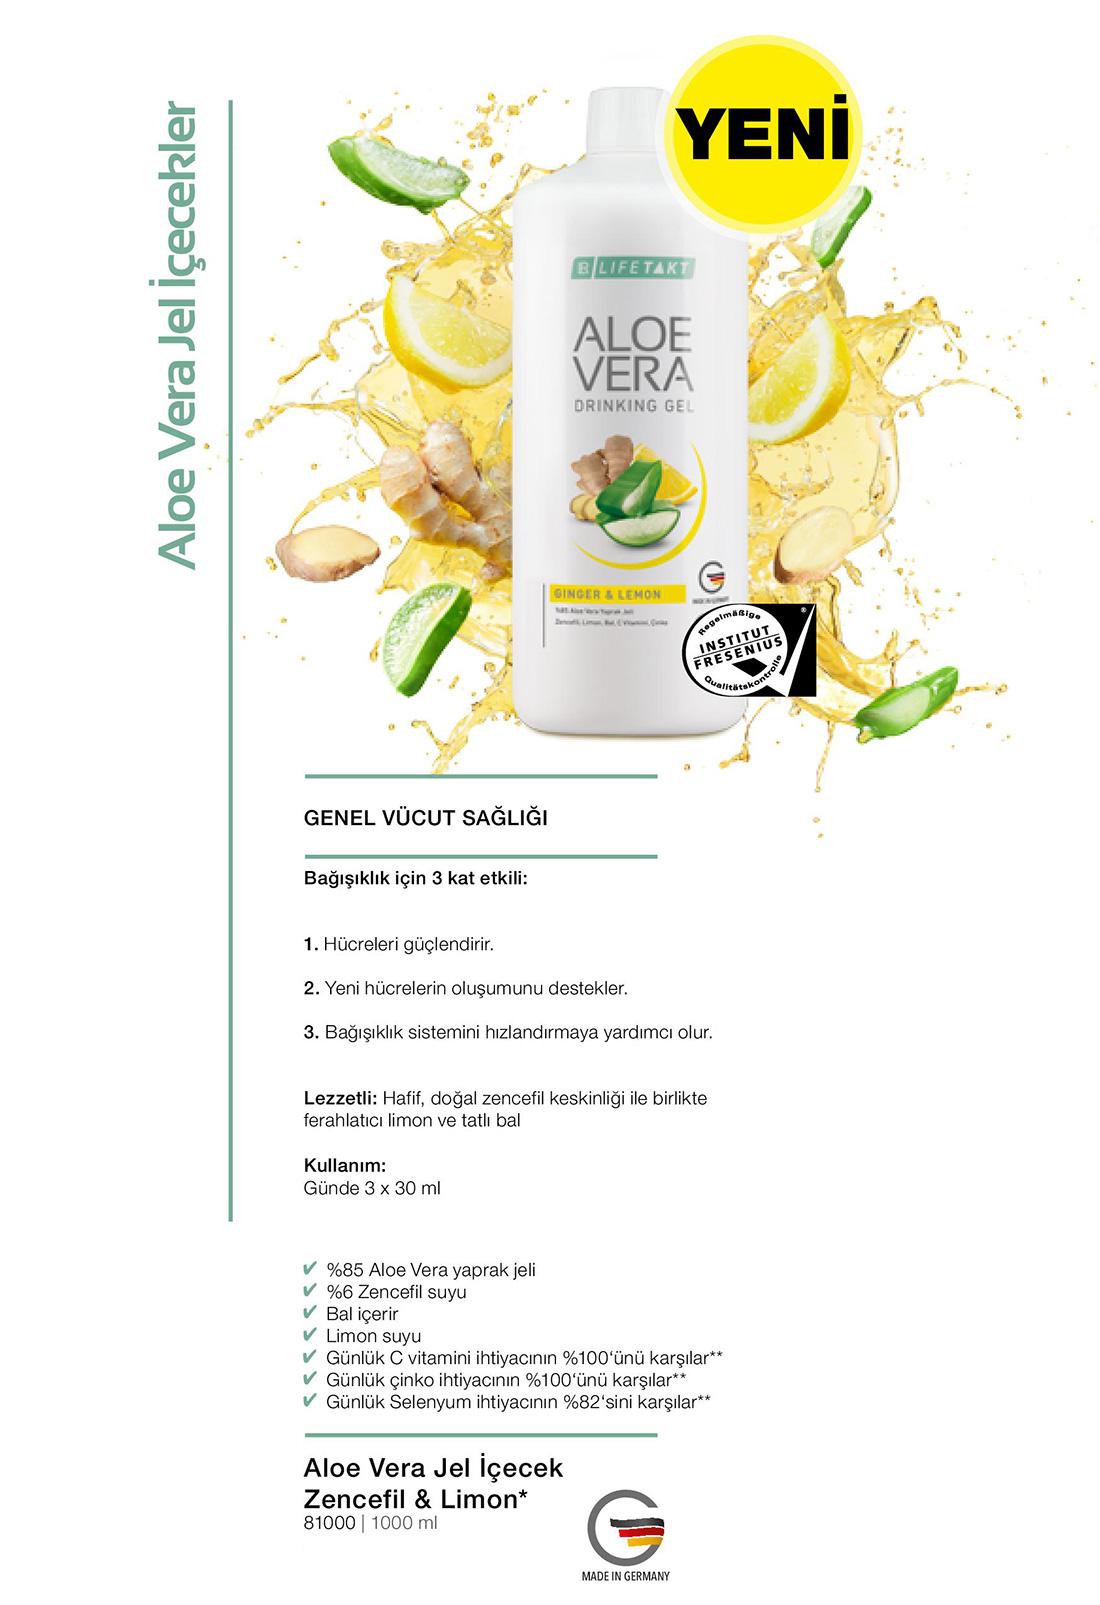 LR Aloe Vera Jel Icecek Zencefil Limon katalog